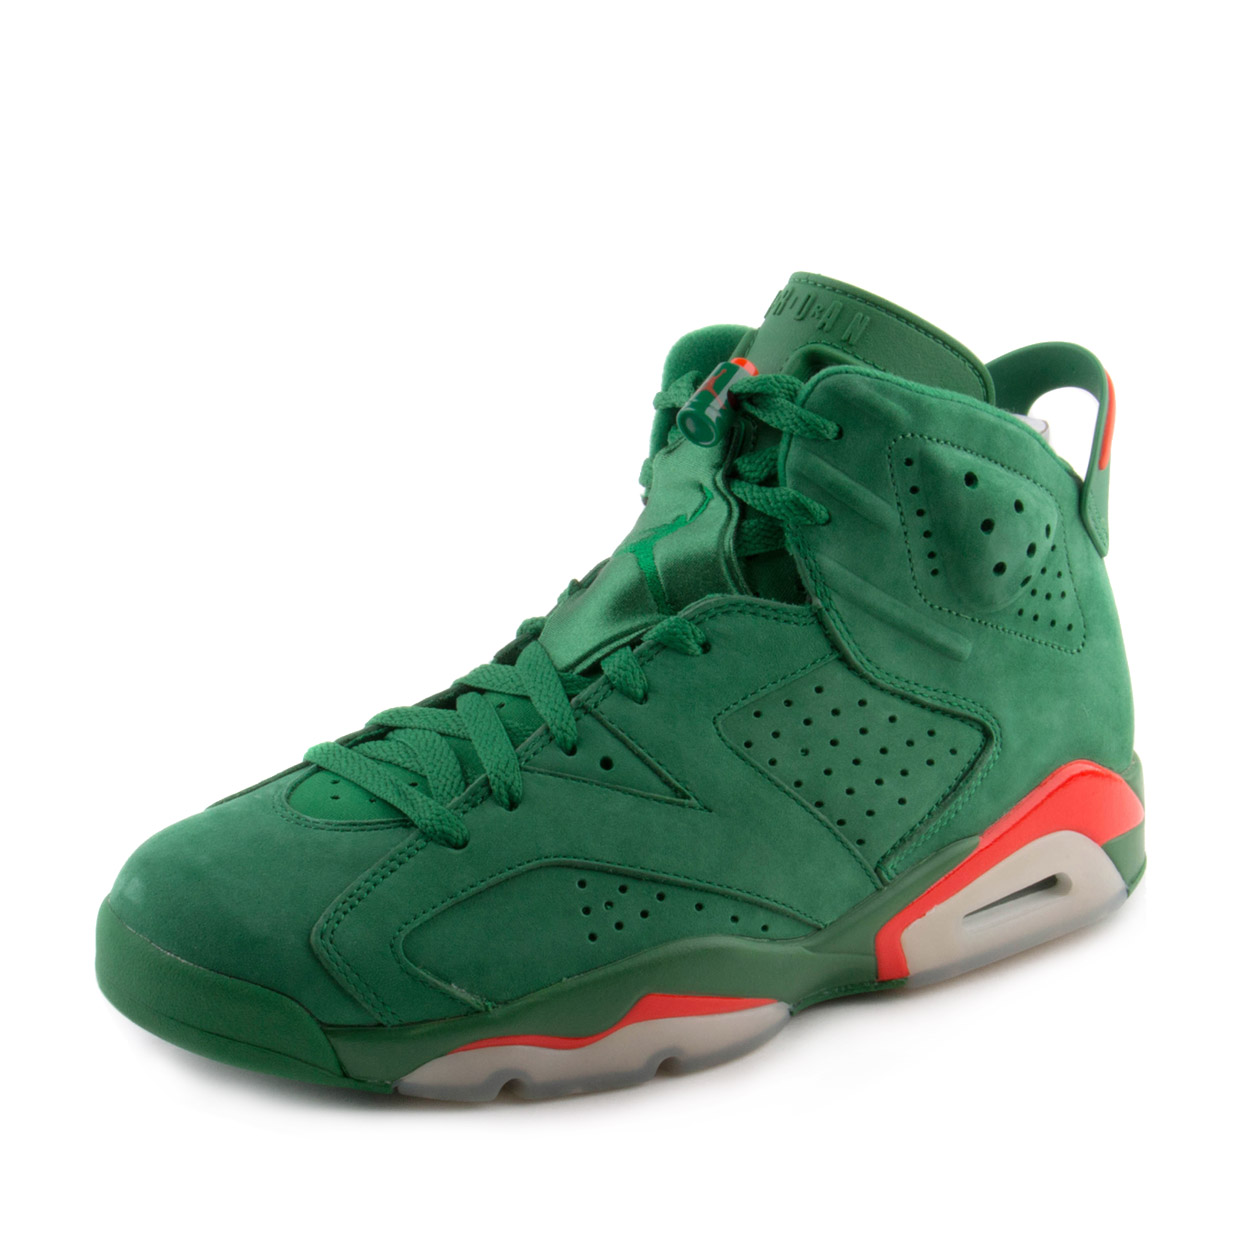 Nike Mens Jordan 6 Retro